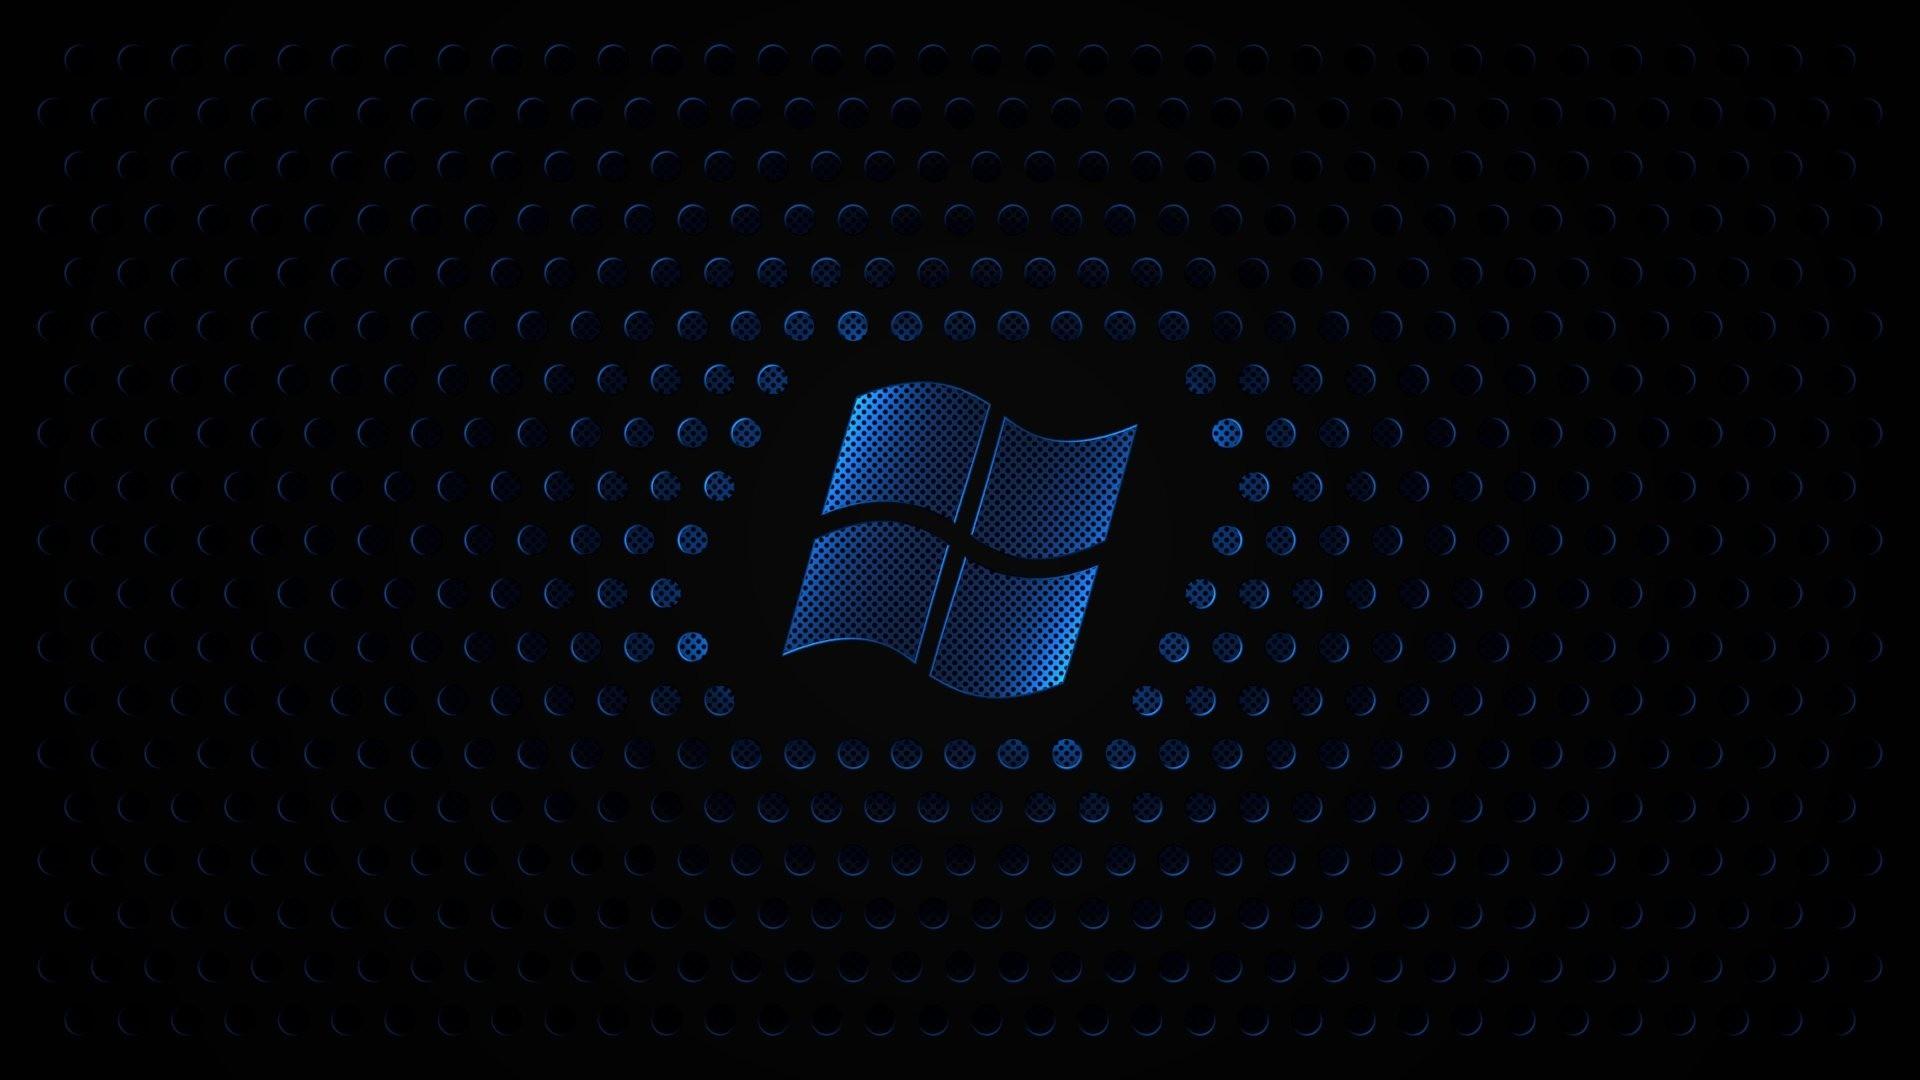 Windows Xp Professional Wallpaper 44 Images